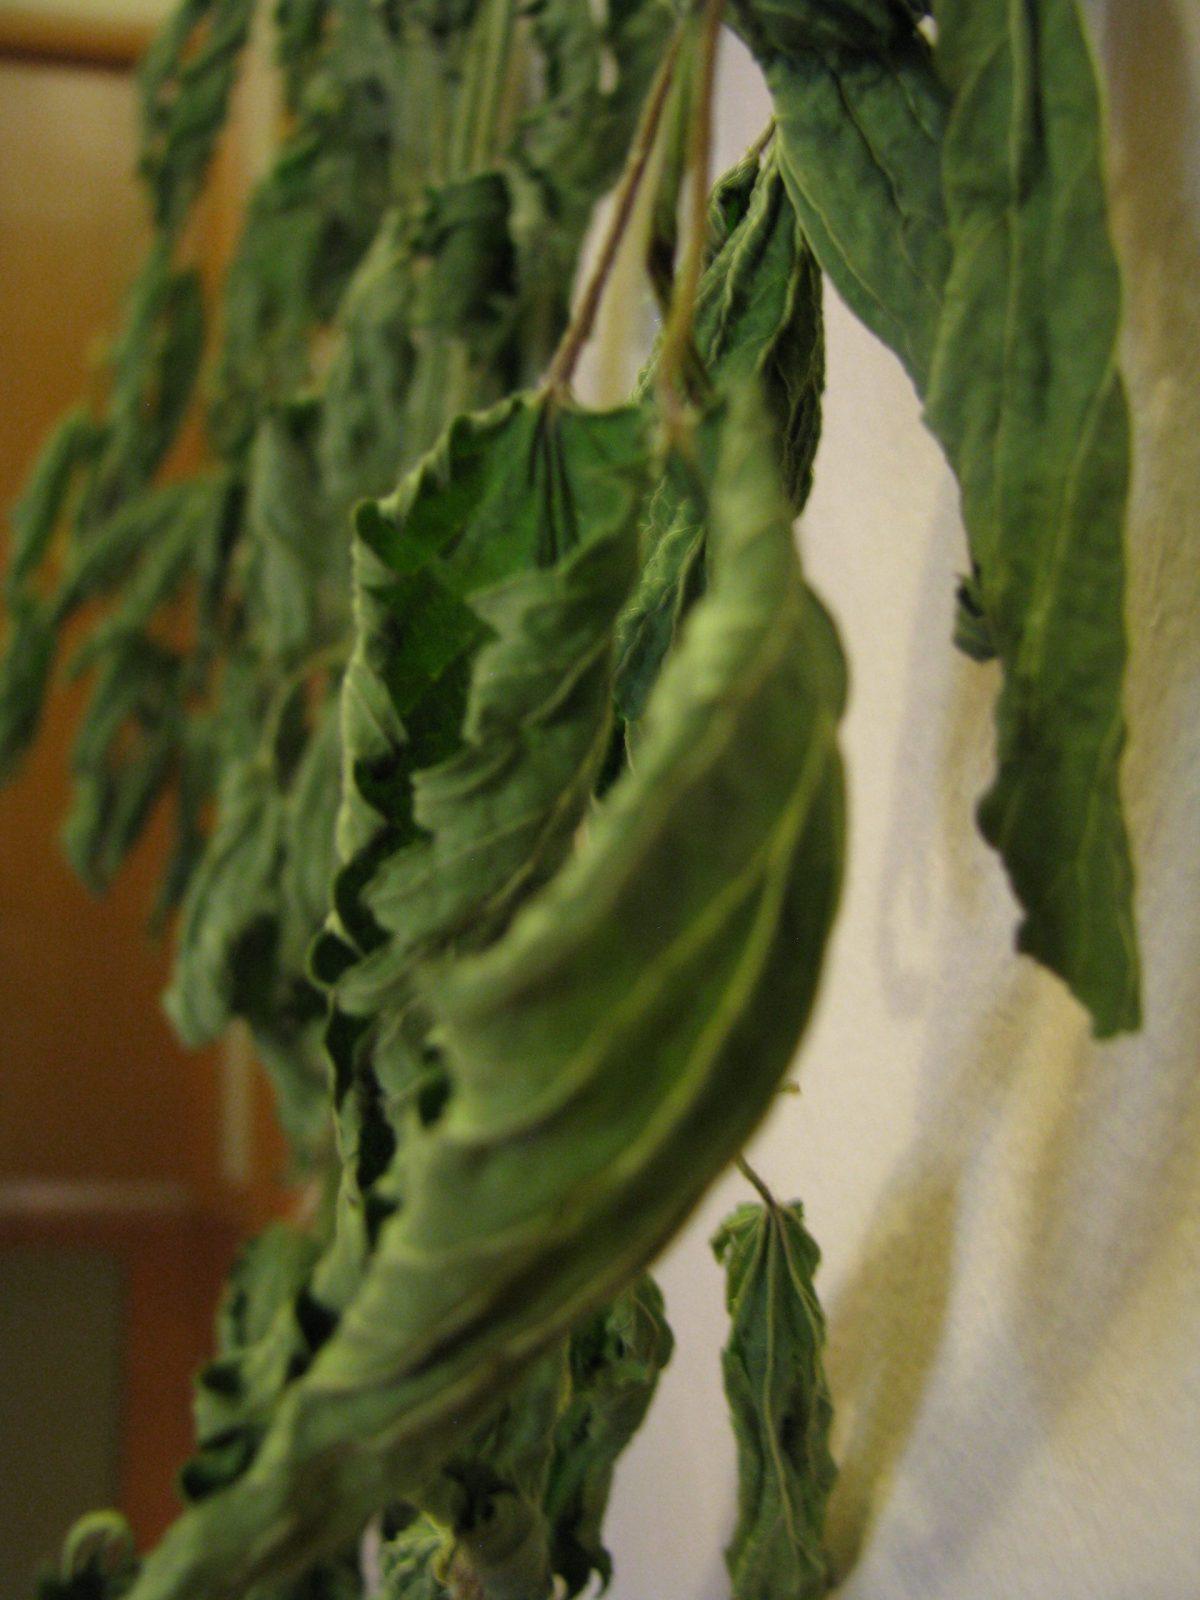 drying nettle leaf